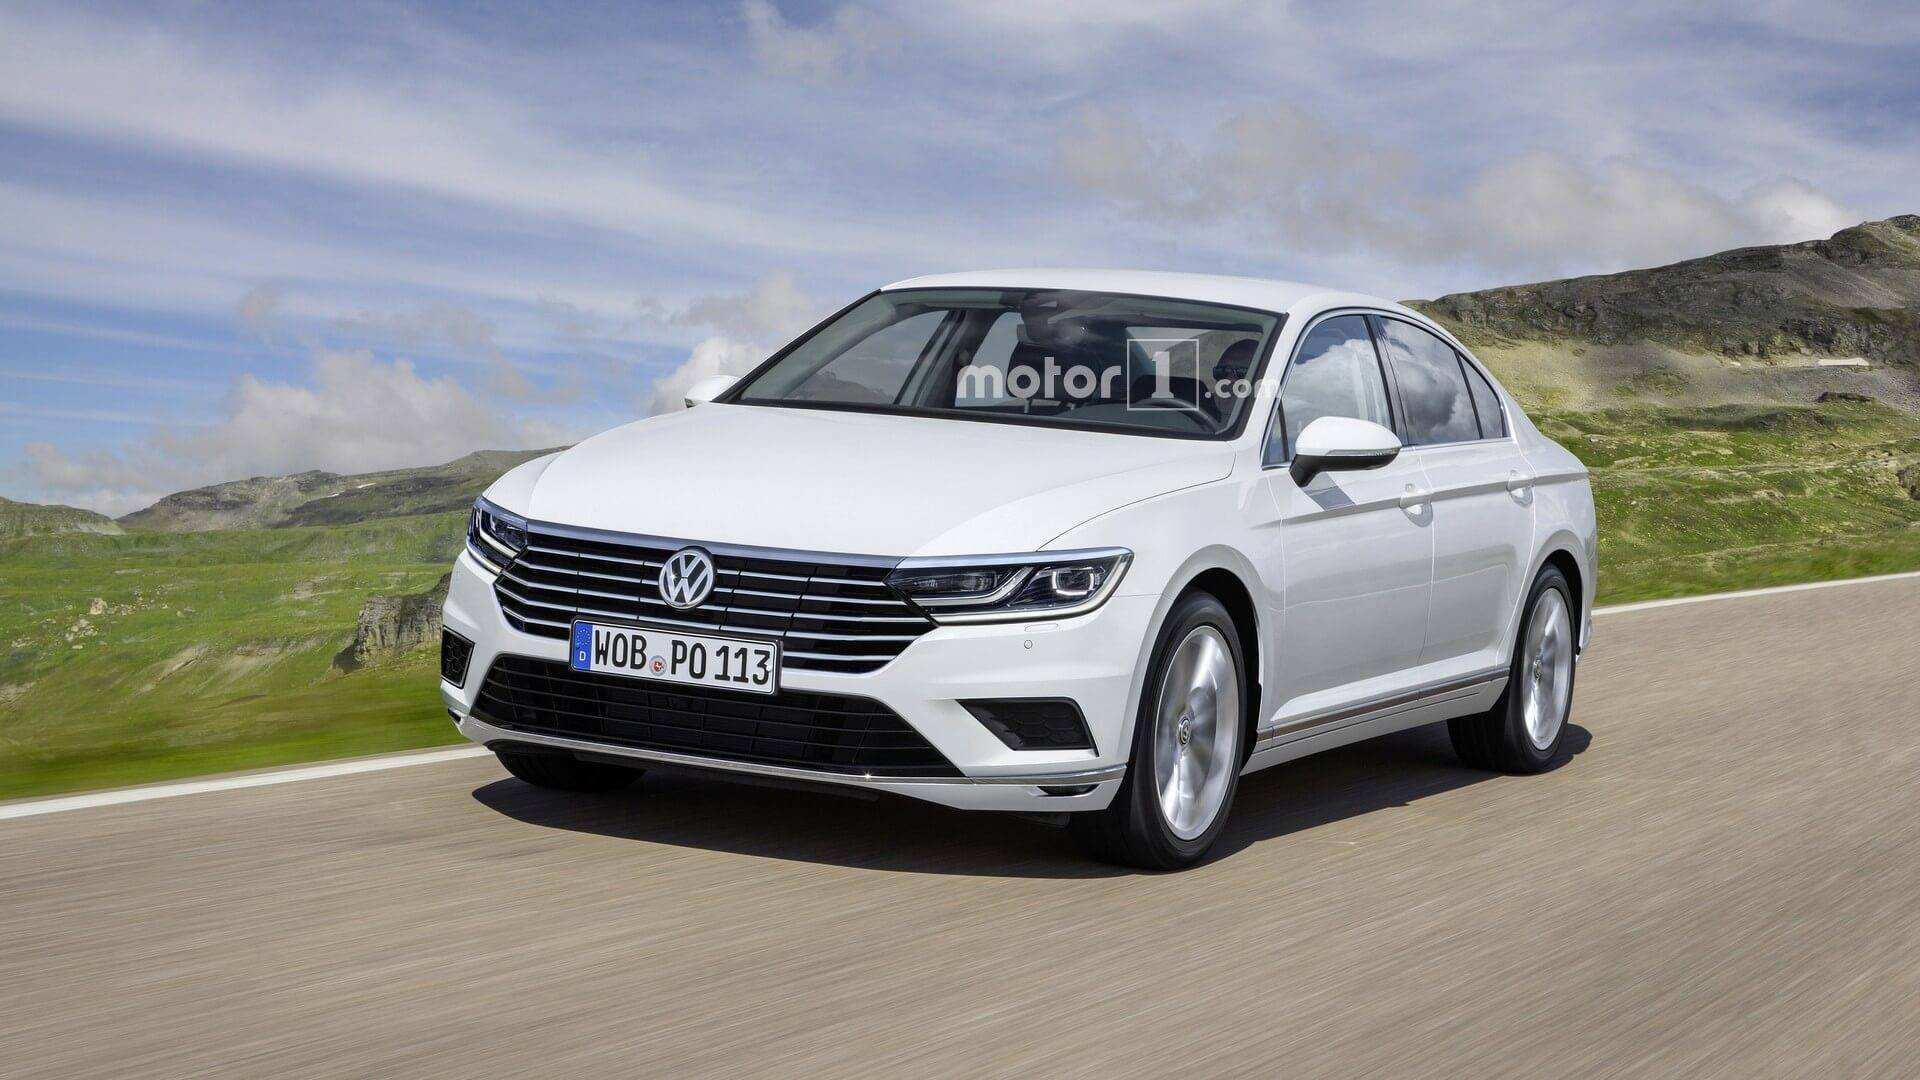 71 Gallery of The Volkswagen Buy Today Pay In 2019 Spesification Concept for The Volkswagen Buy Today Pay In 2019 Spesification